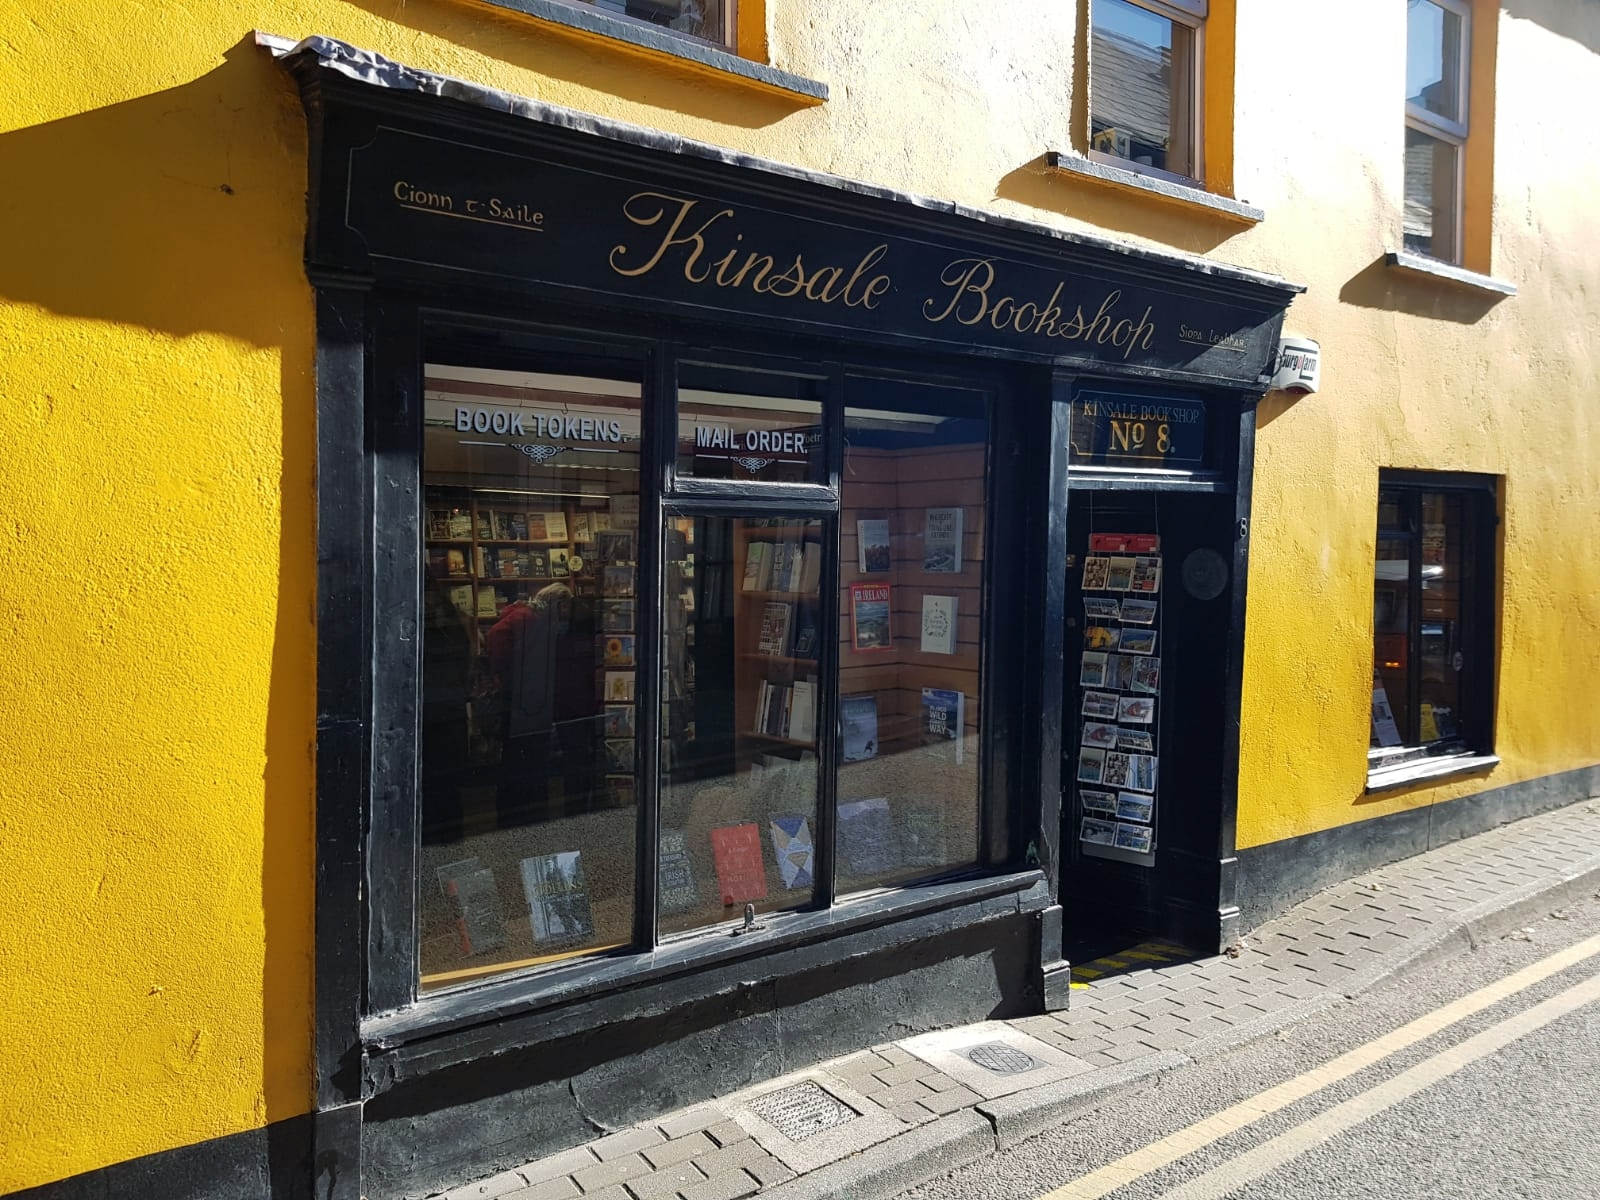 Kinsale bookshop